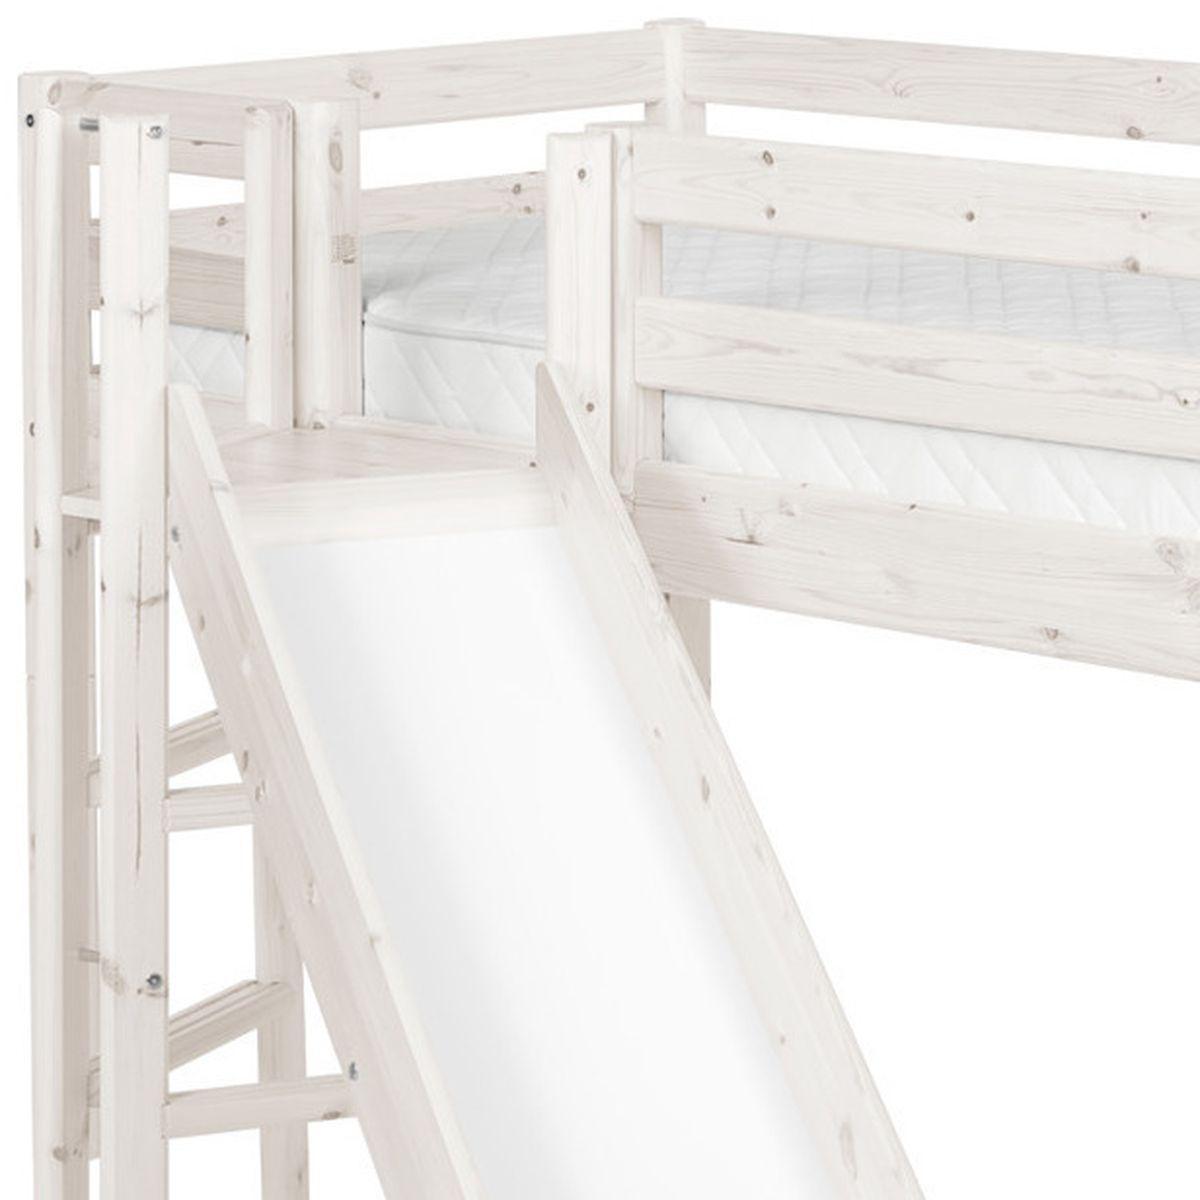 Lit mi-hauteur Classic Line 90x200 cm + plate-forme + toboggan by Flexa